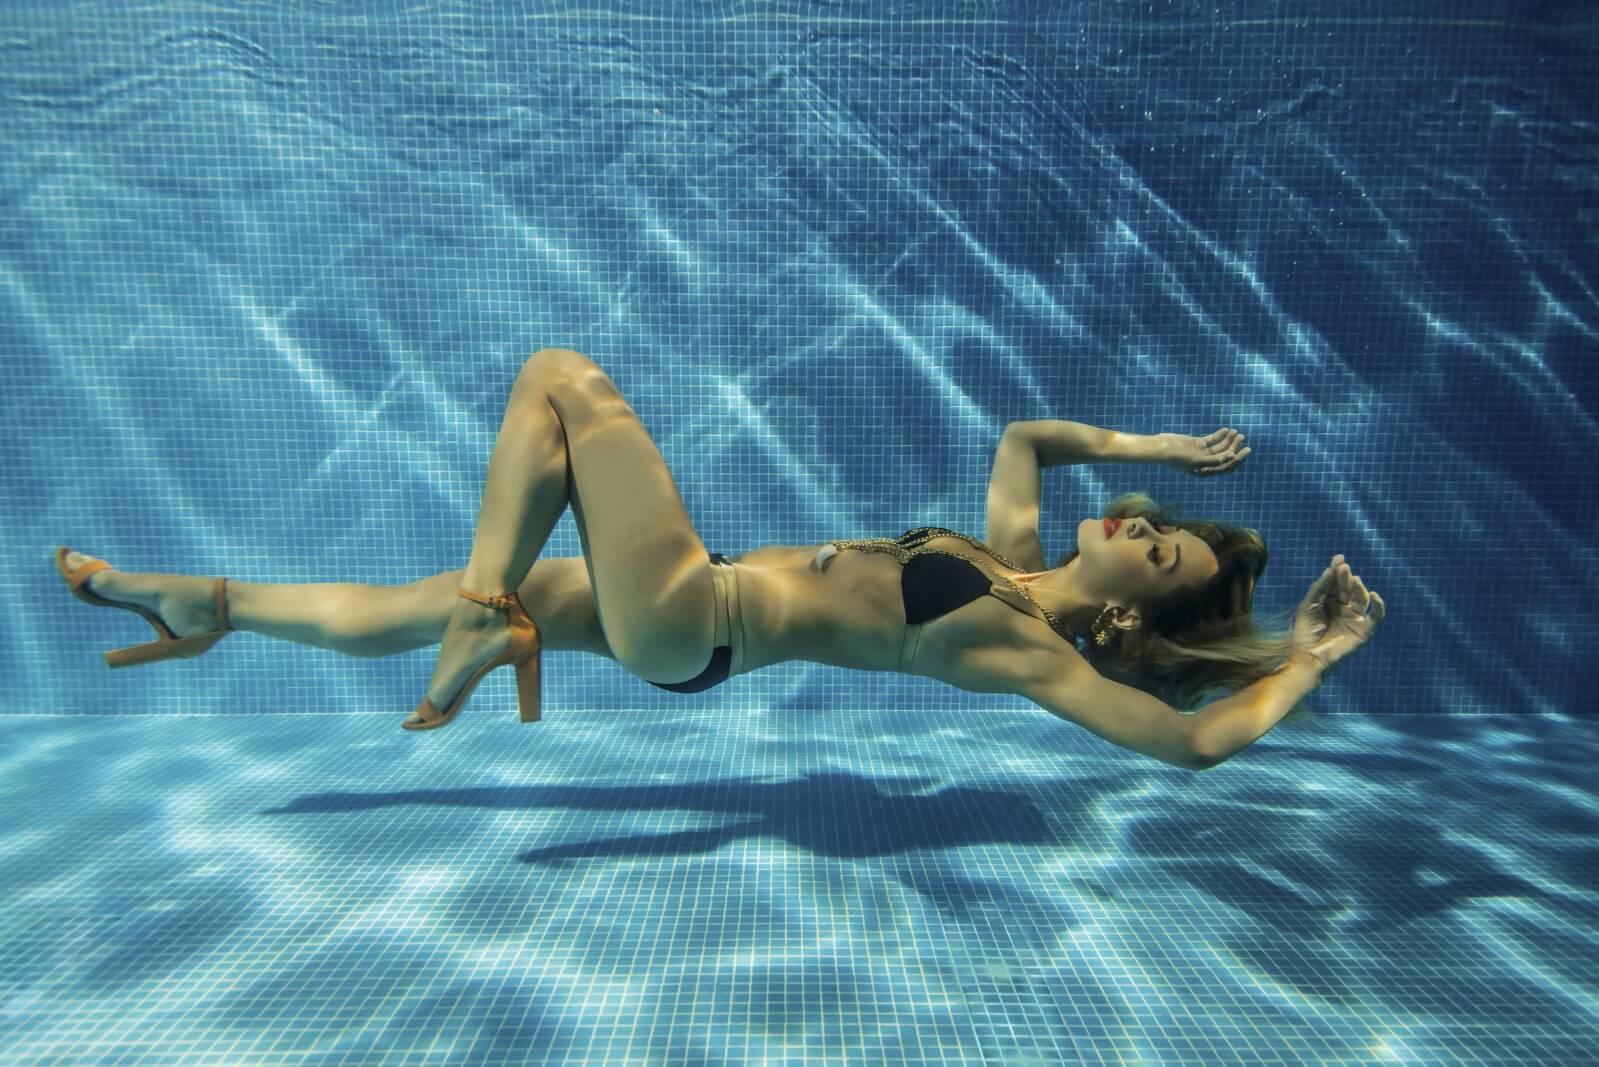 Amazing sex underwater must see - 3 5